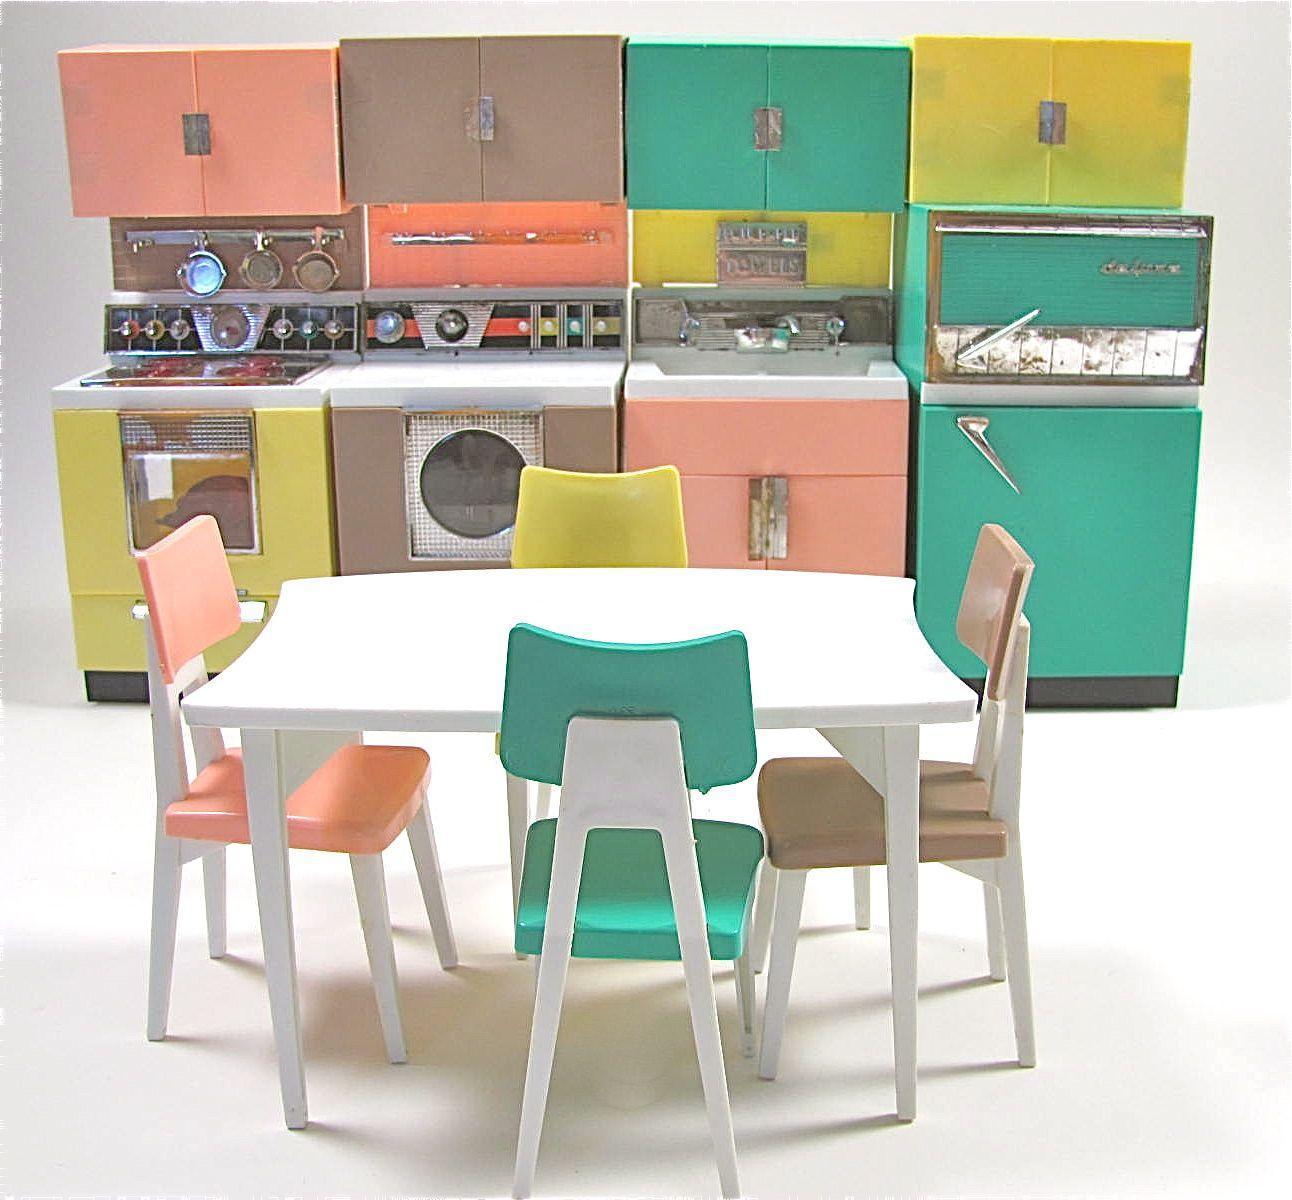 Dream Kitchen Toy: Deluxe Reading Dream Kitchen Set, Fits Barbie Dolls